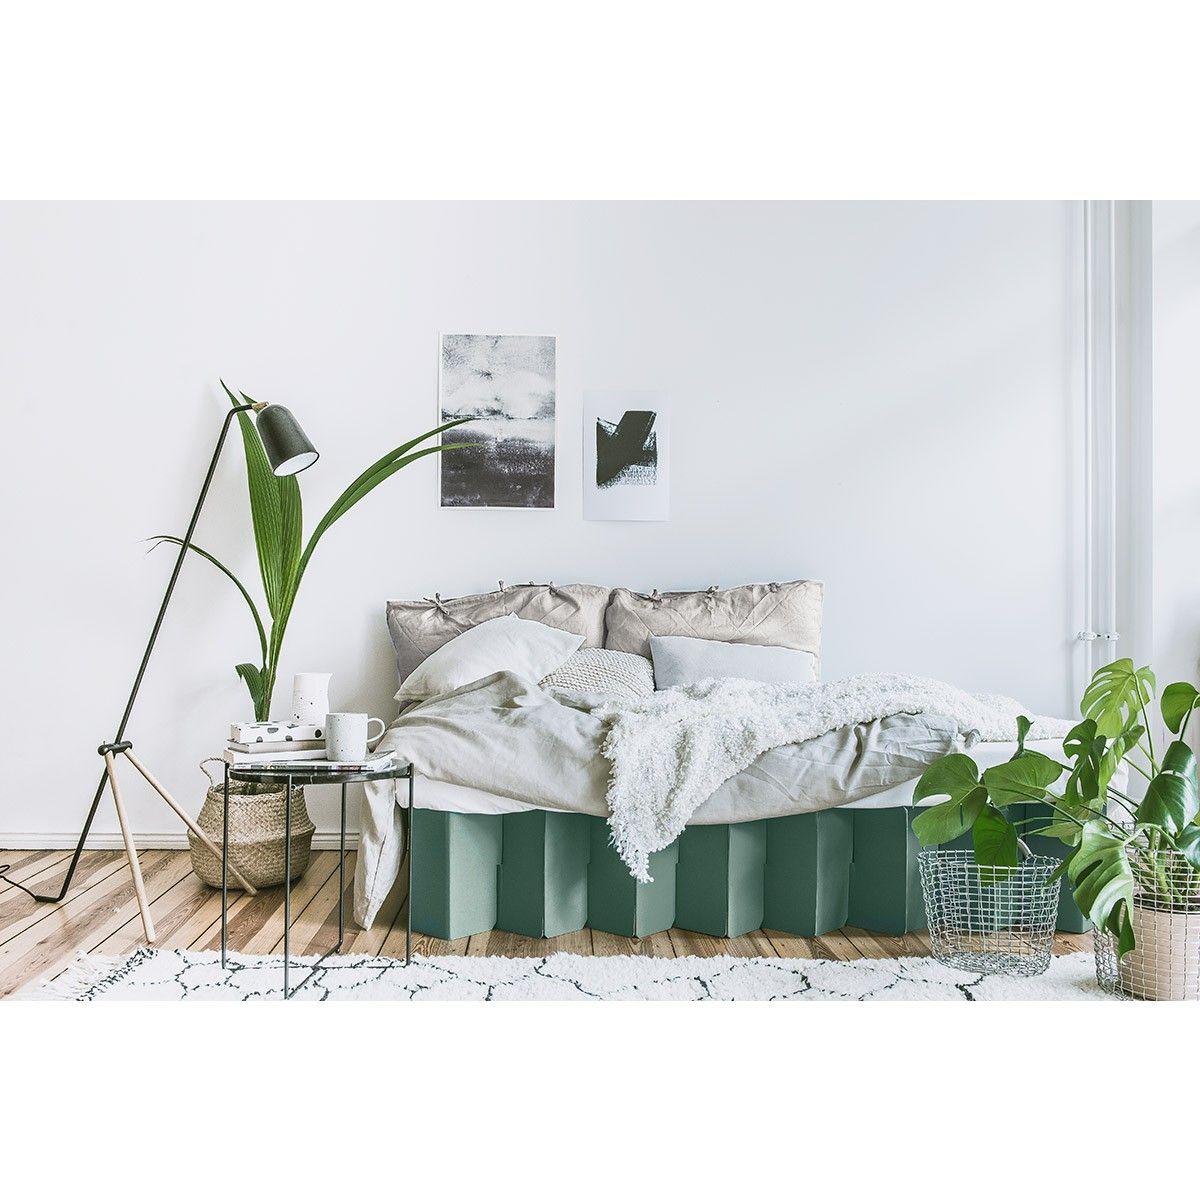 Bett 2.0 (salbei) ROOM IN A BOX selekkt Heim für